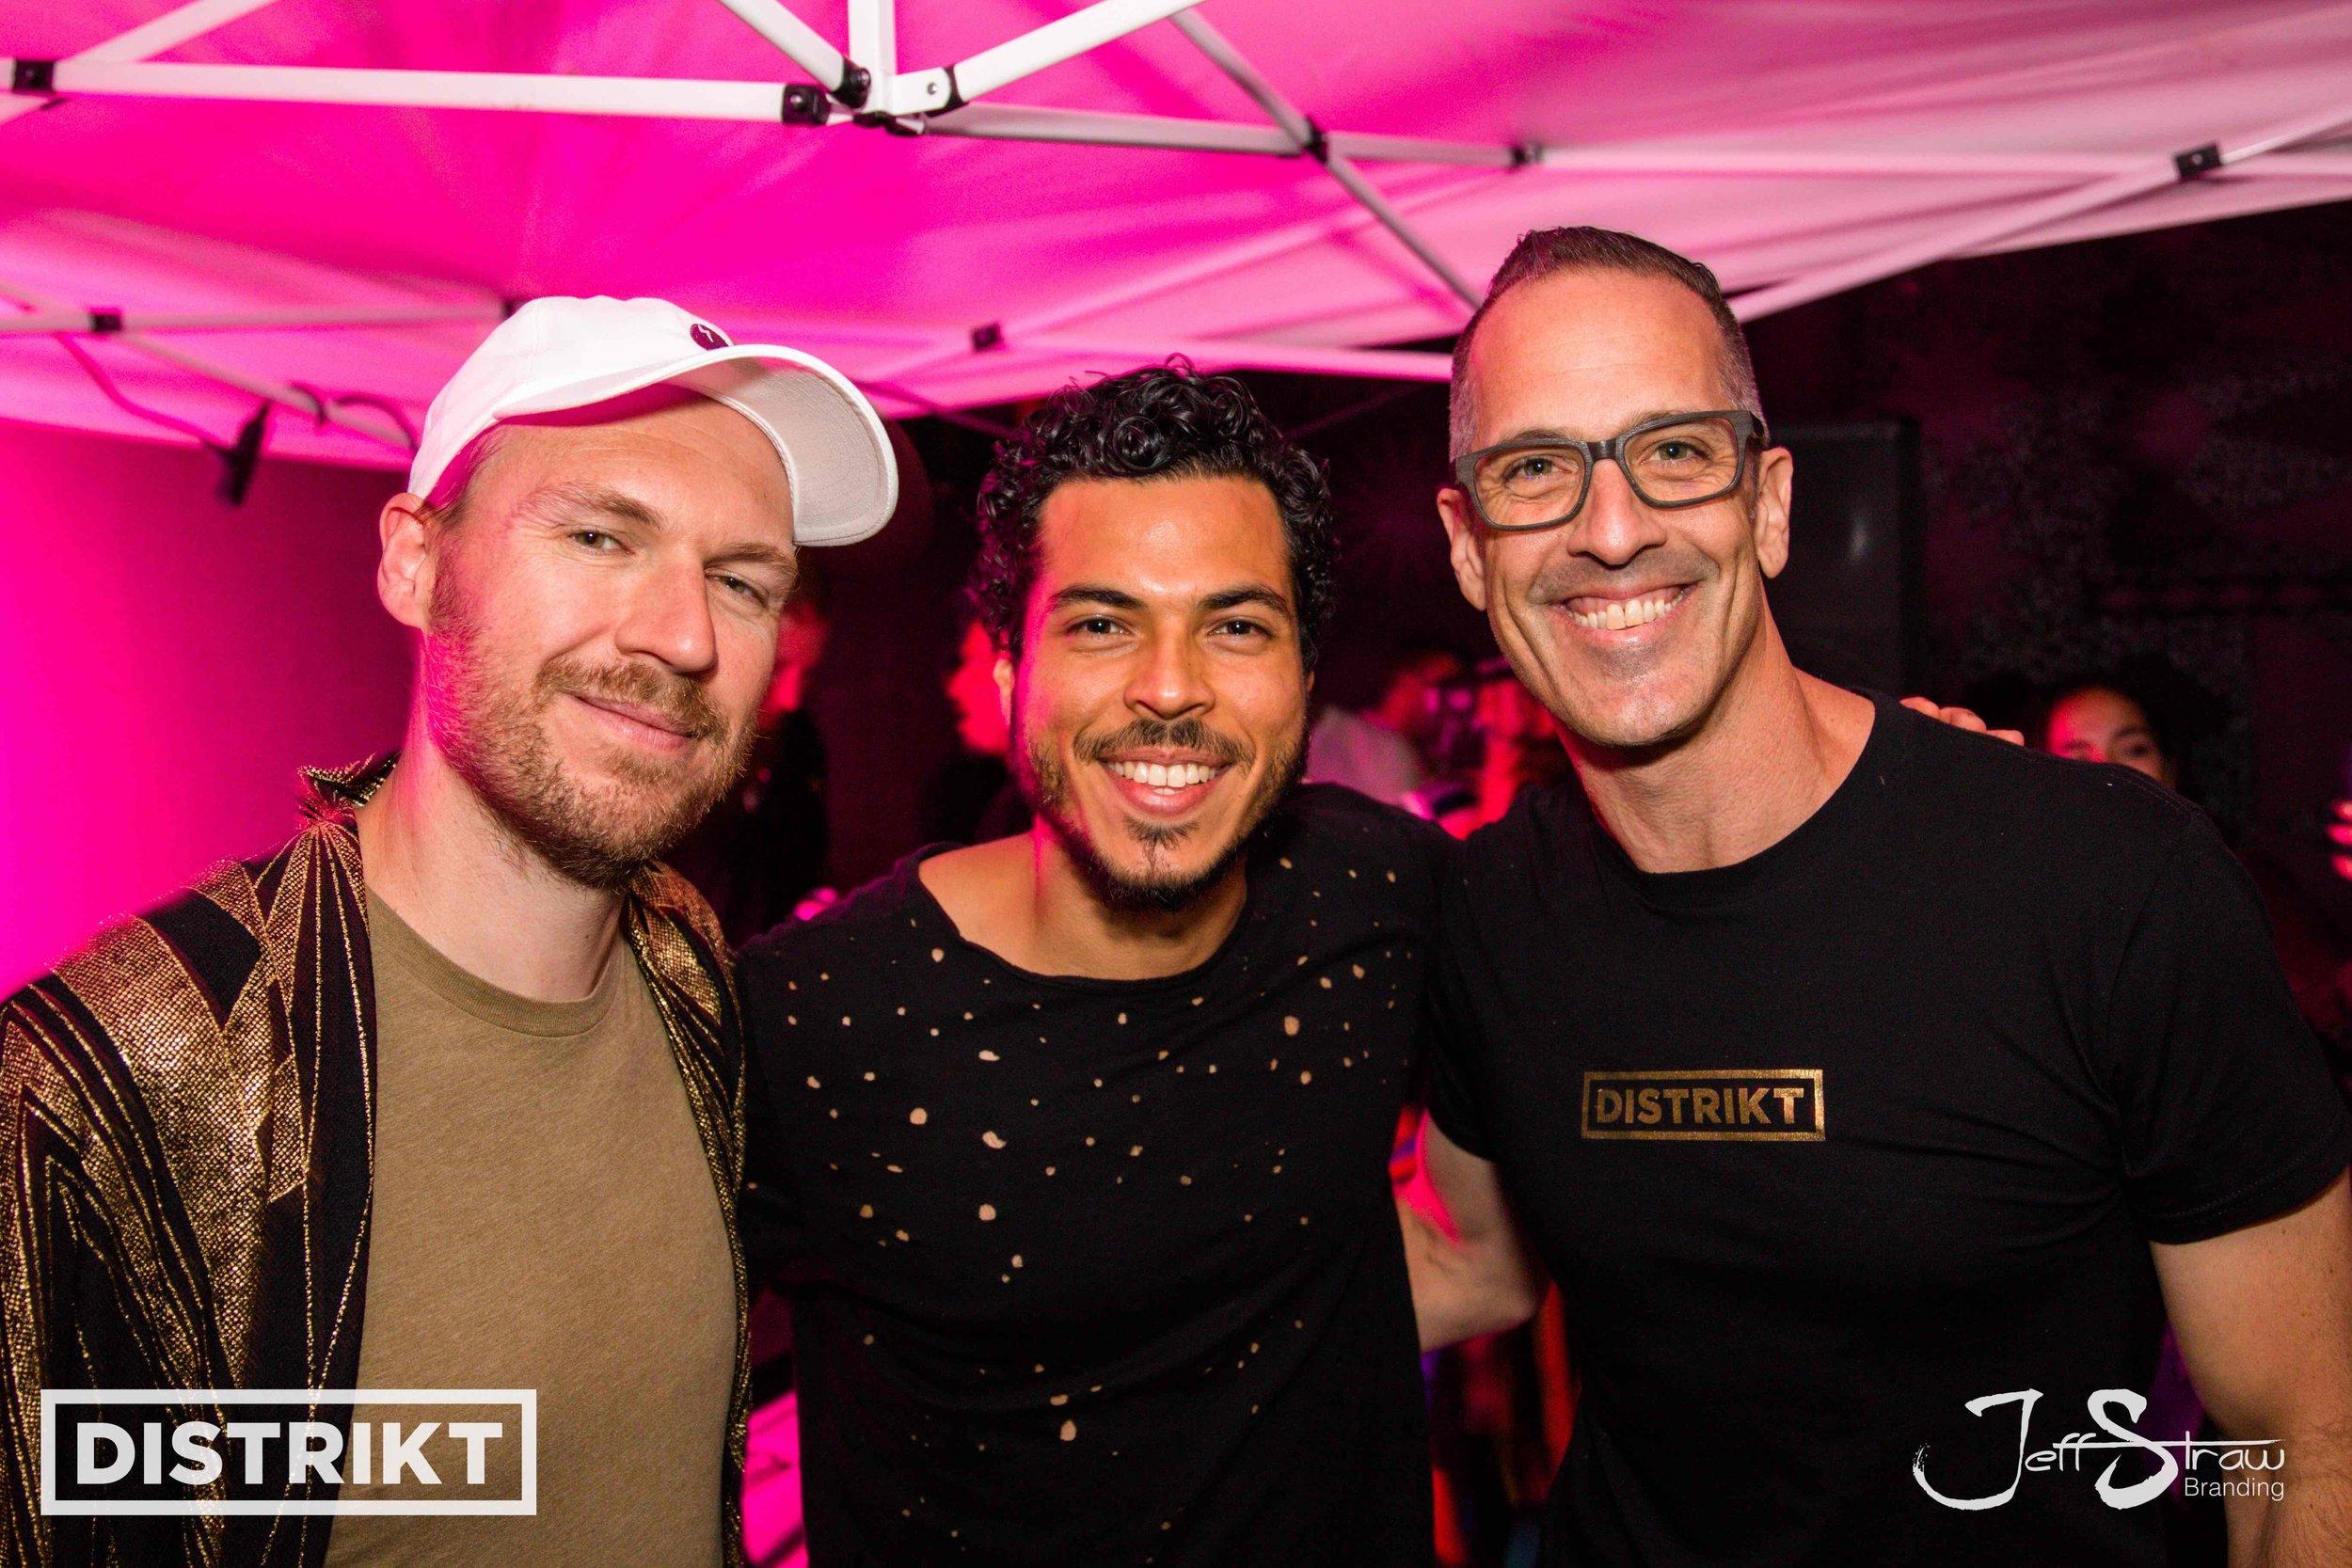 Distrikt - Brian CID, Worthy, DJ Kramer and more at Midway SF 8/4/19